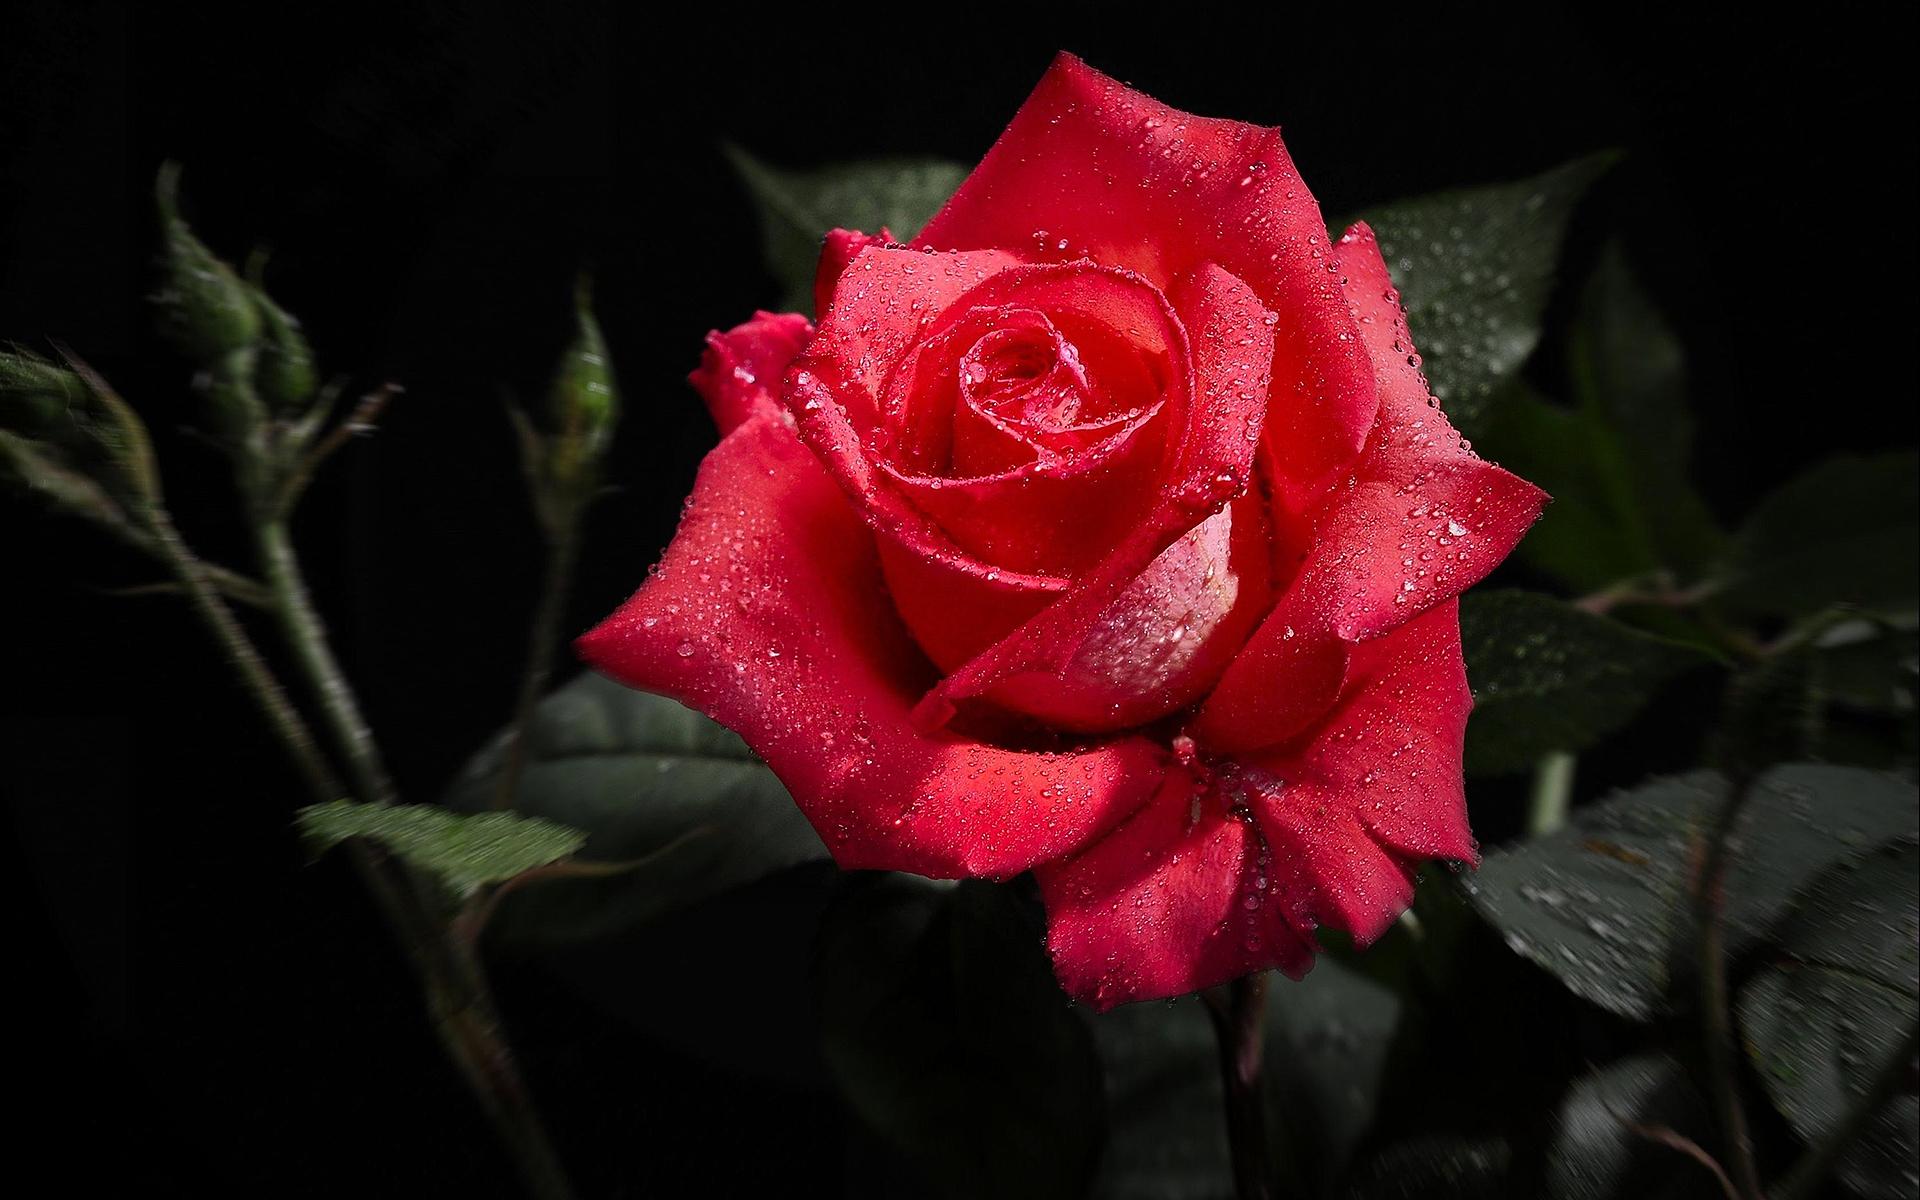 Wet red rose